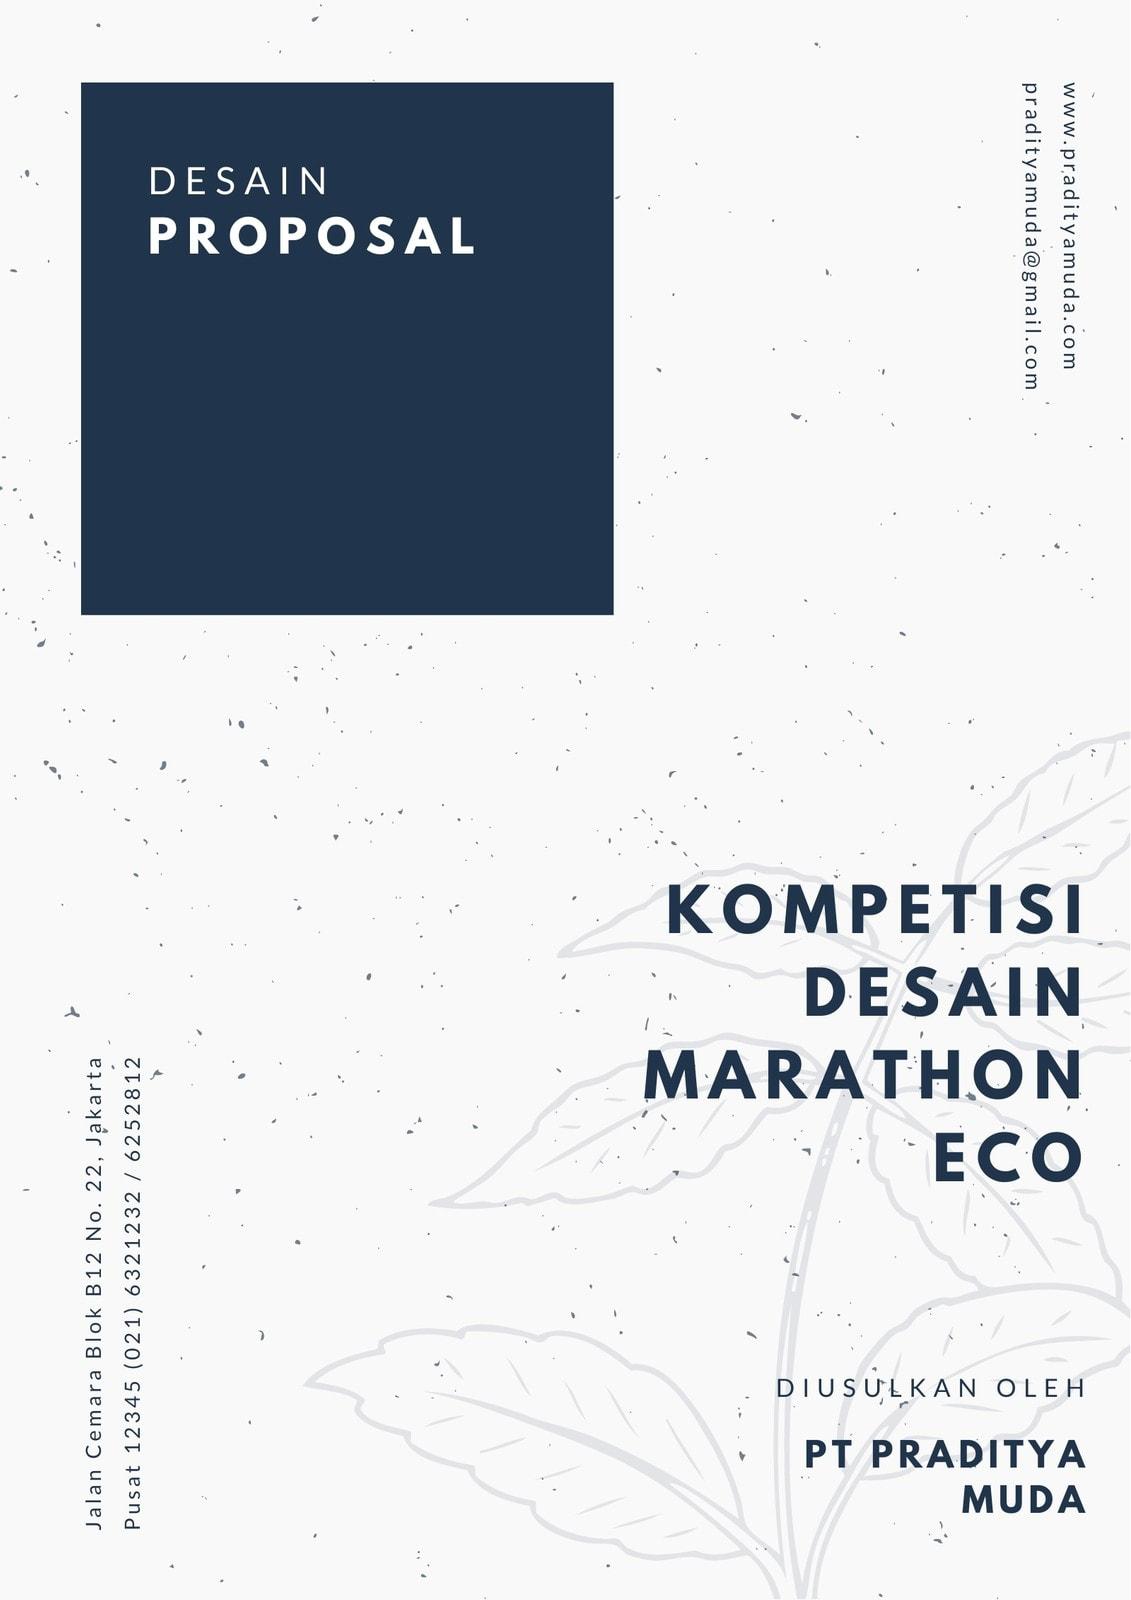 Biru dan Krem Kuno Umum Proposal